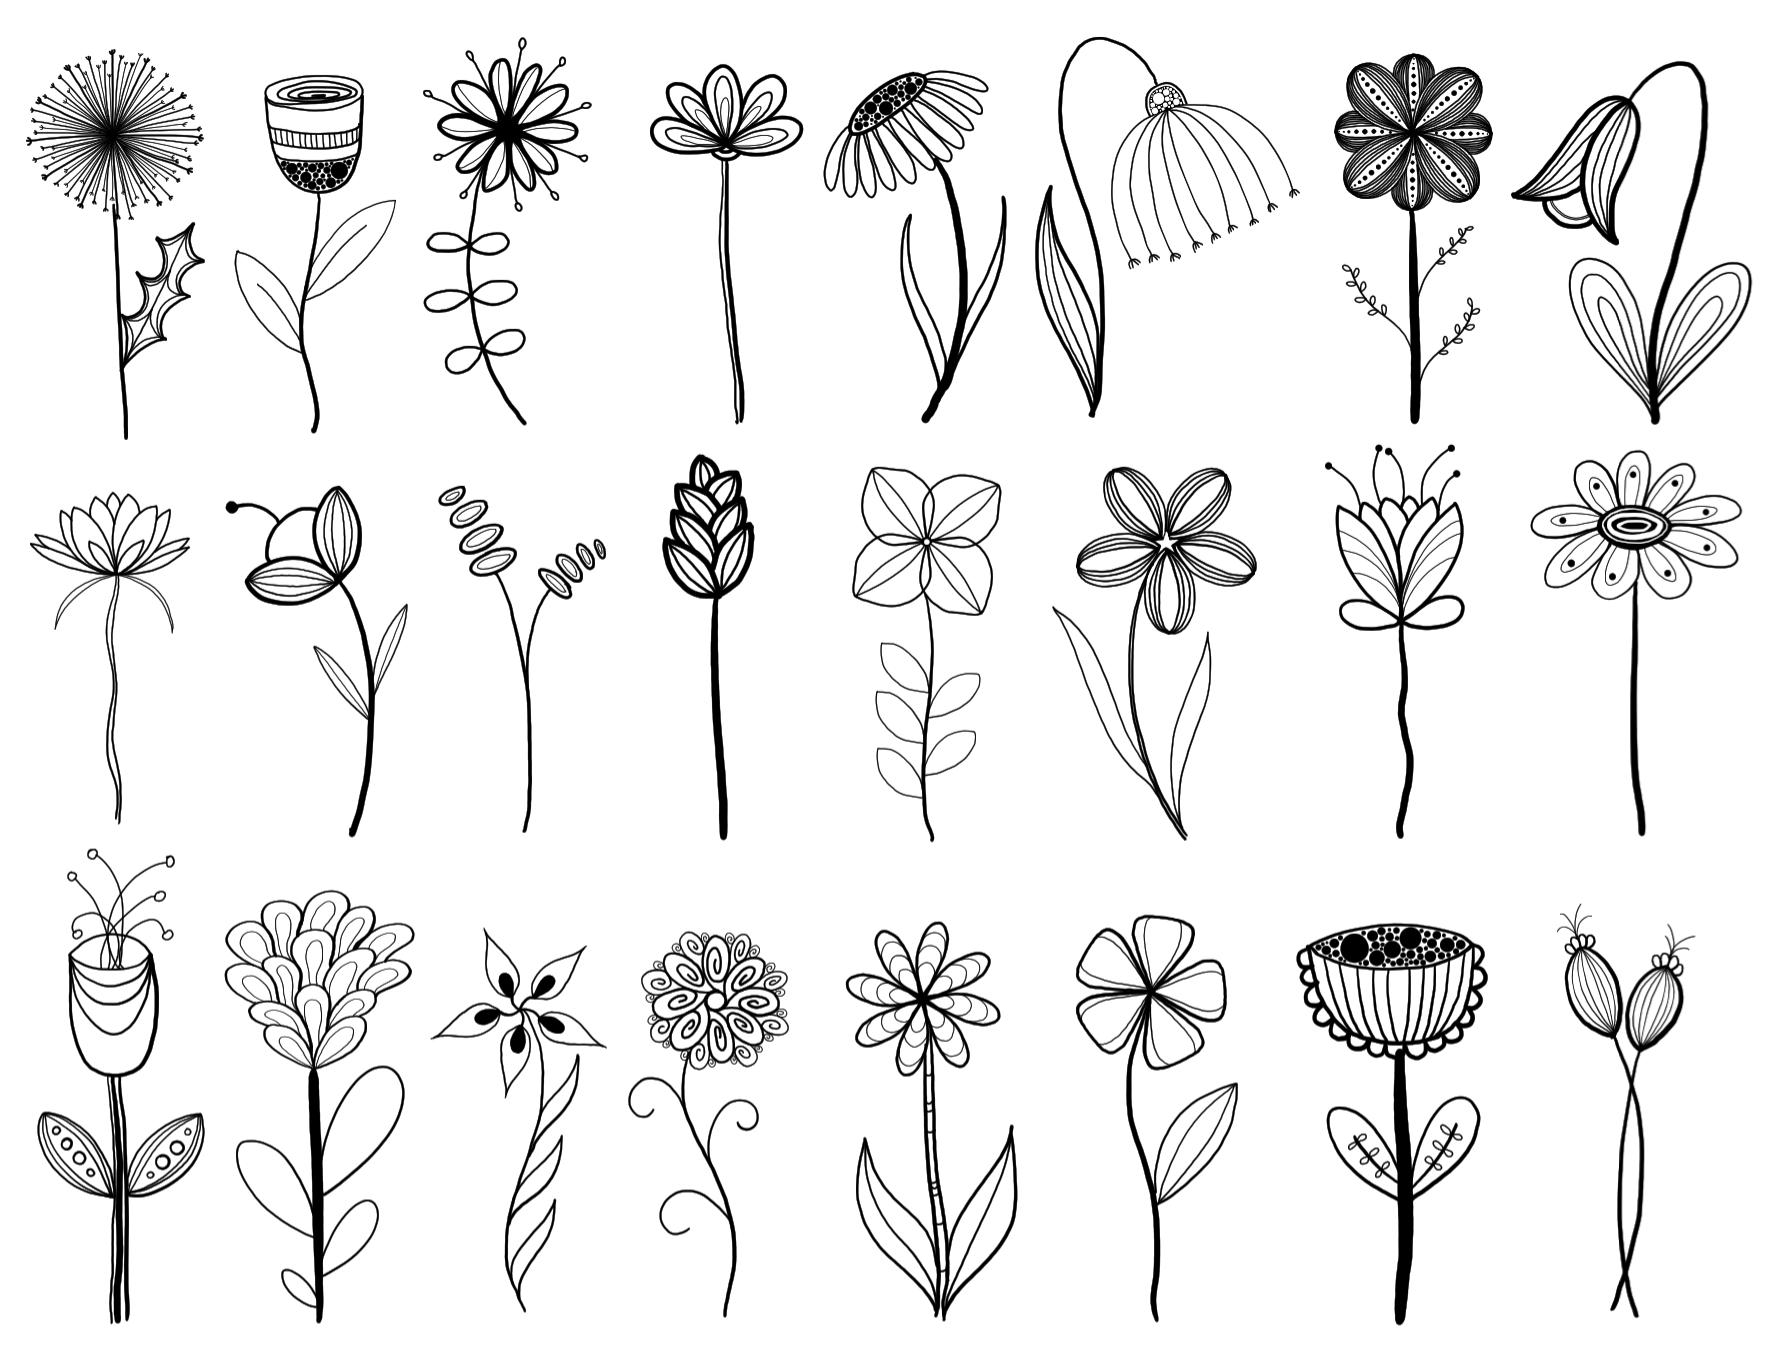 Line Art Flower Simple : My original artwork inspired by many ️ doodle flower